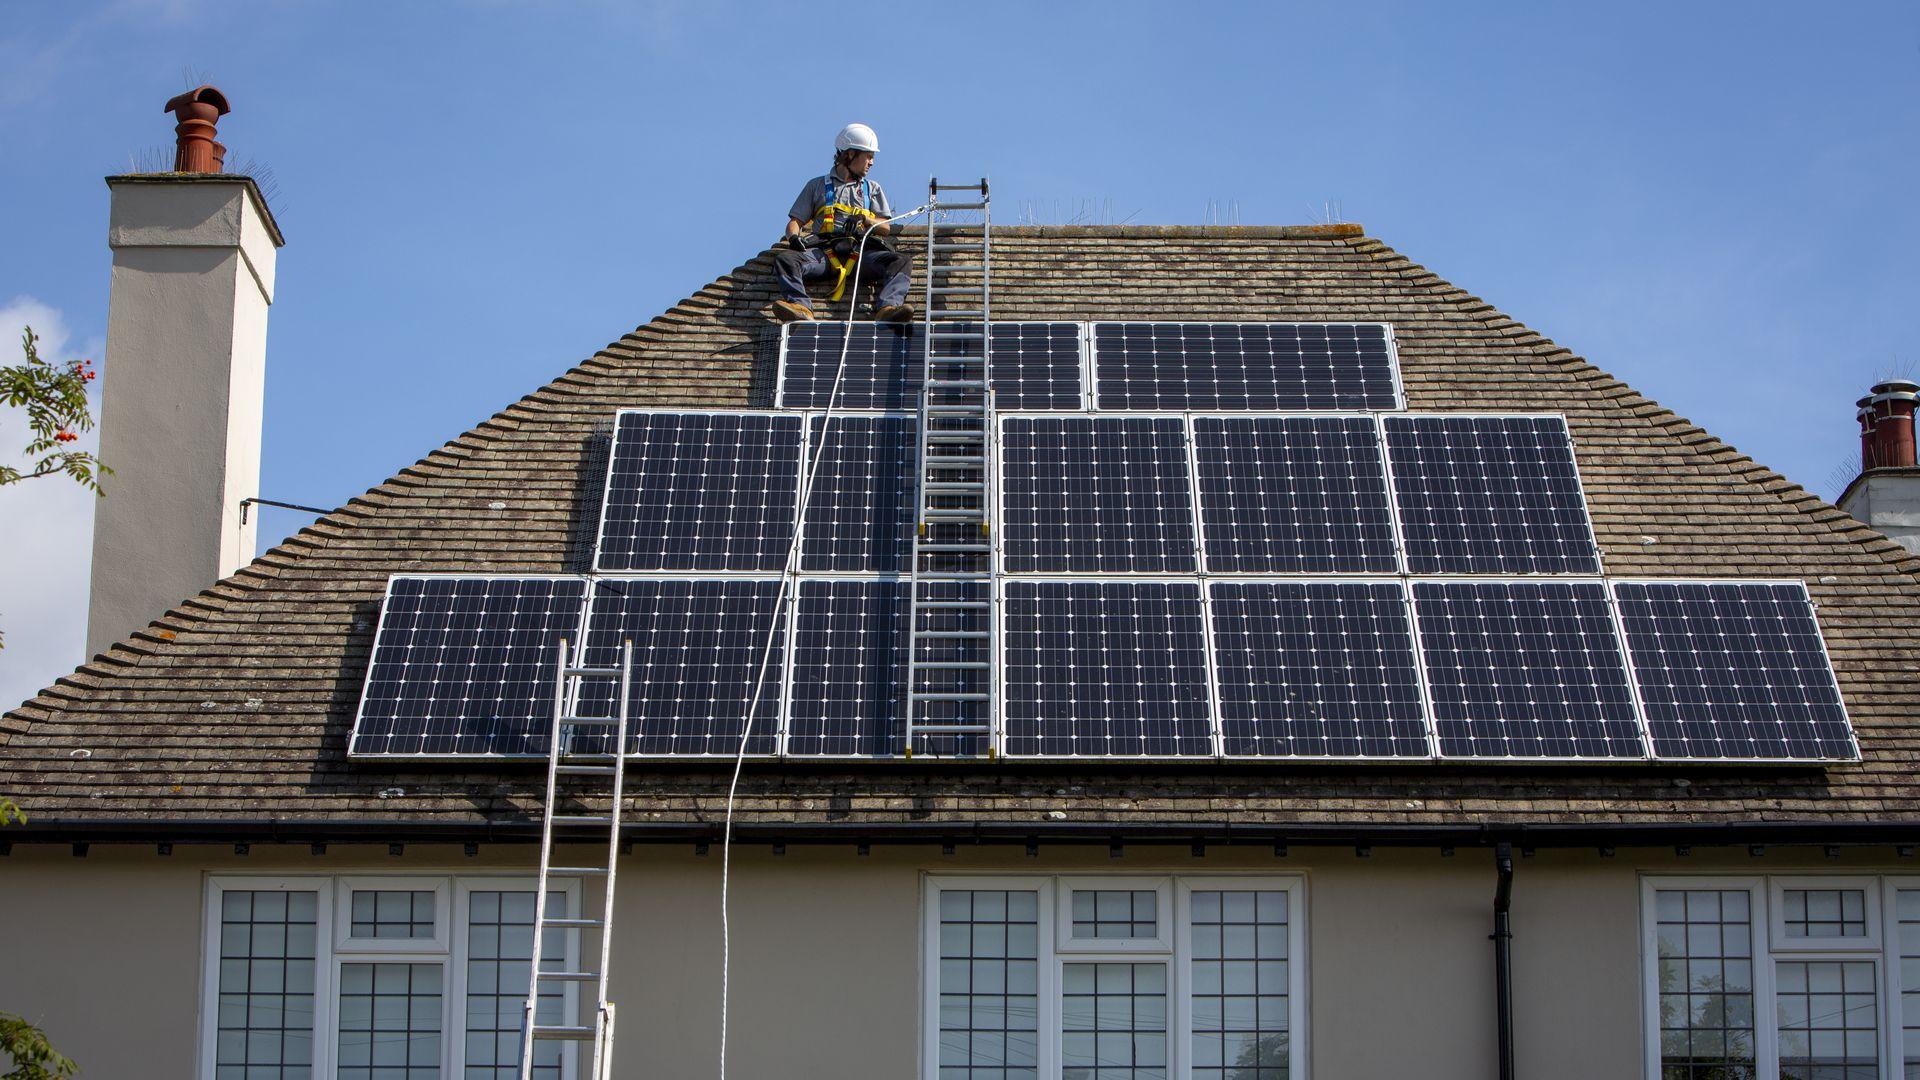 PG&E electricity shut-offs drive Californians' interest in solar power